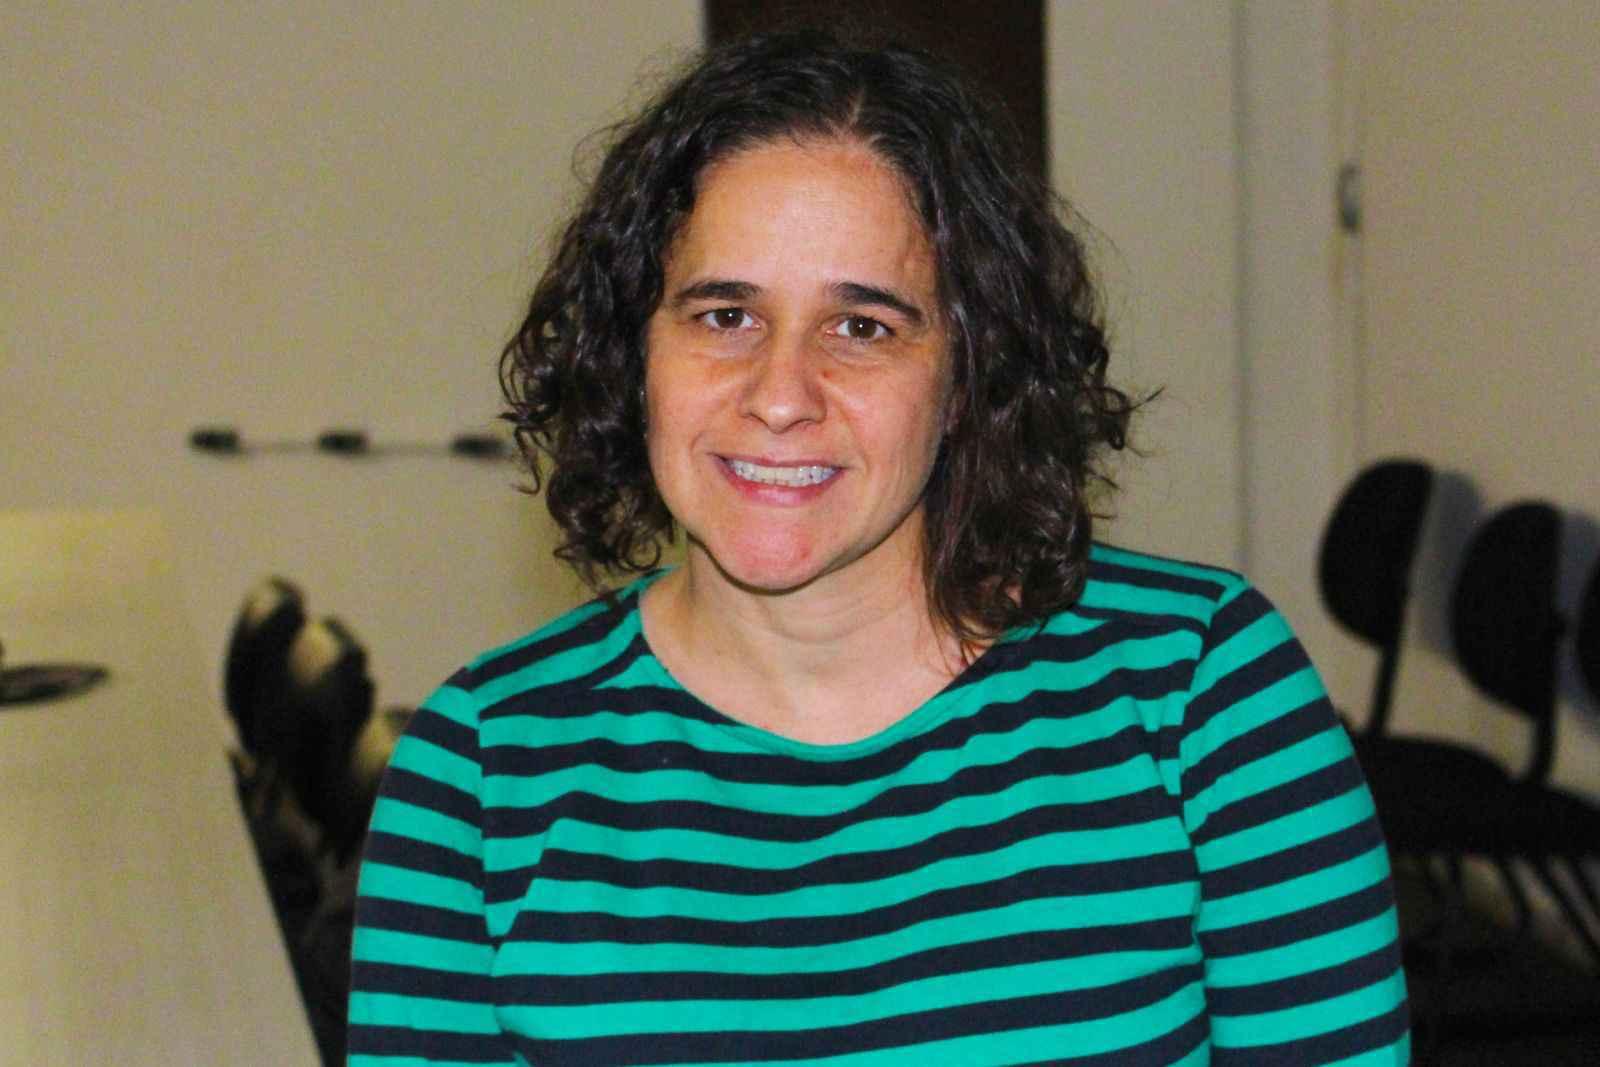 Professora Maria Luísa Magalhães Nogueira, do Departamento de Psicologia da UFMG